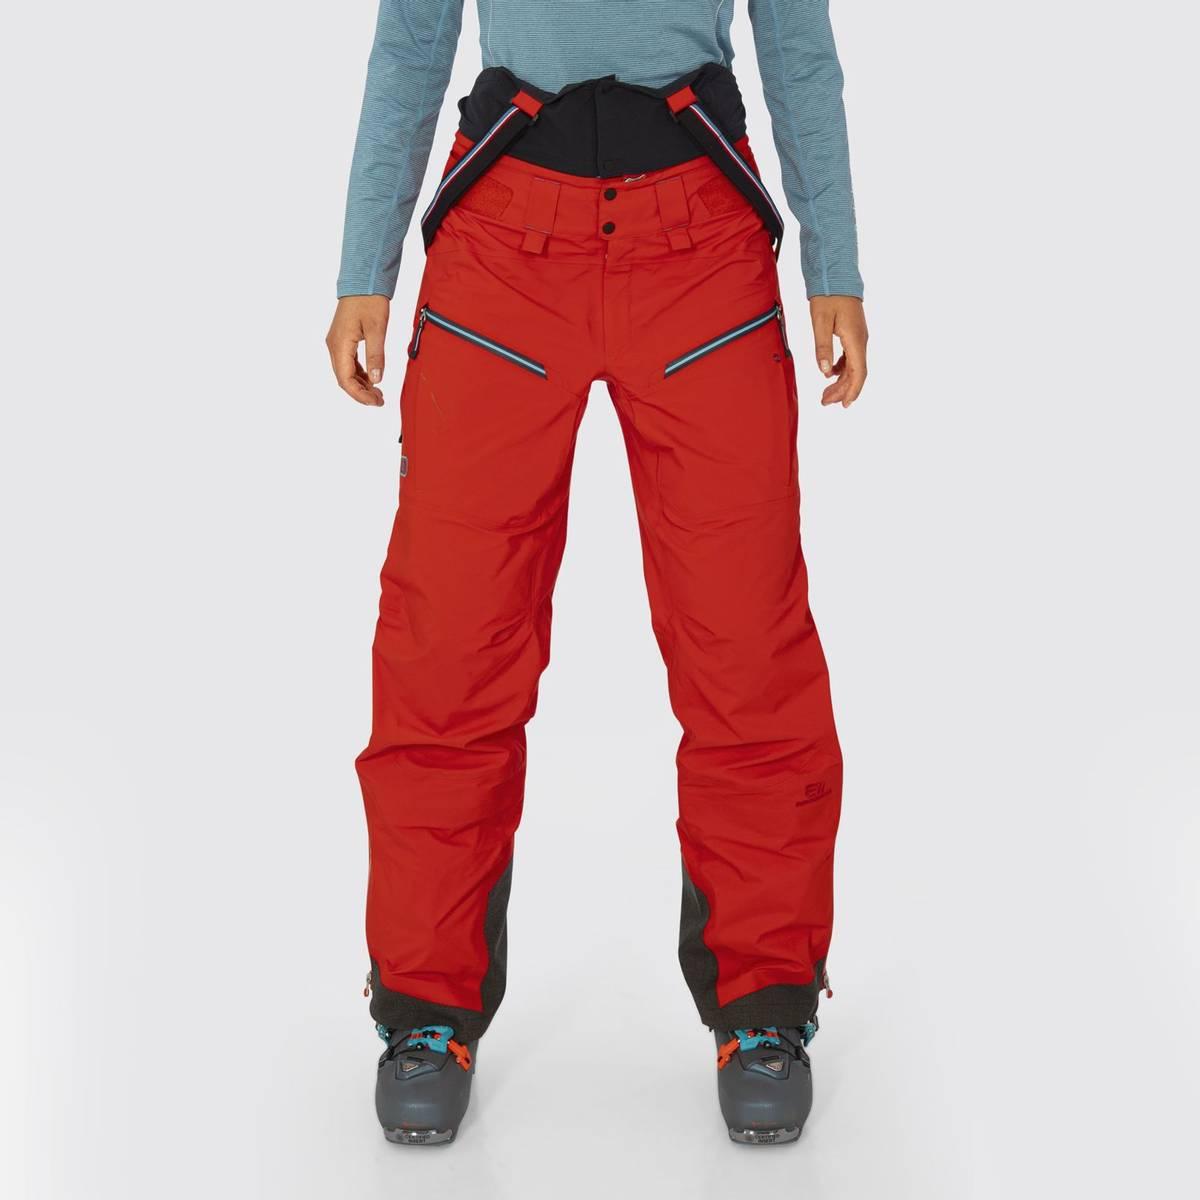 Elevenate W Bec de Rosses Pants Red Glow